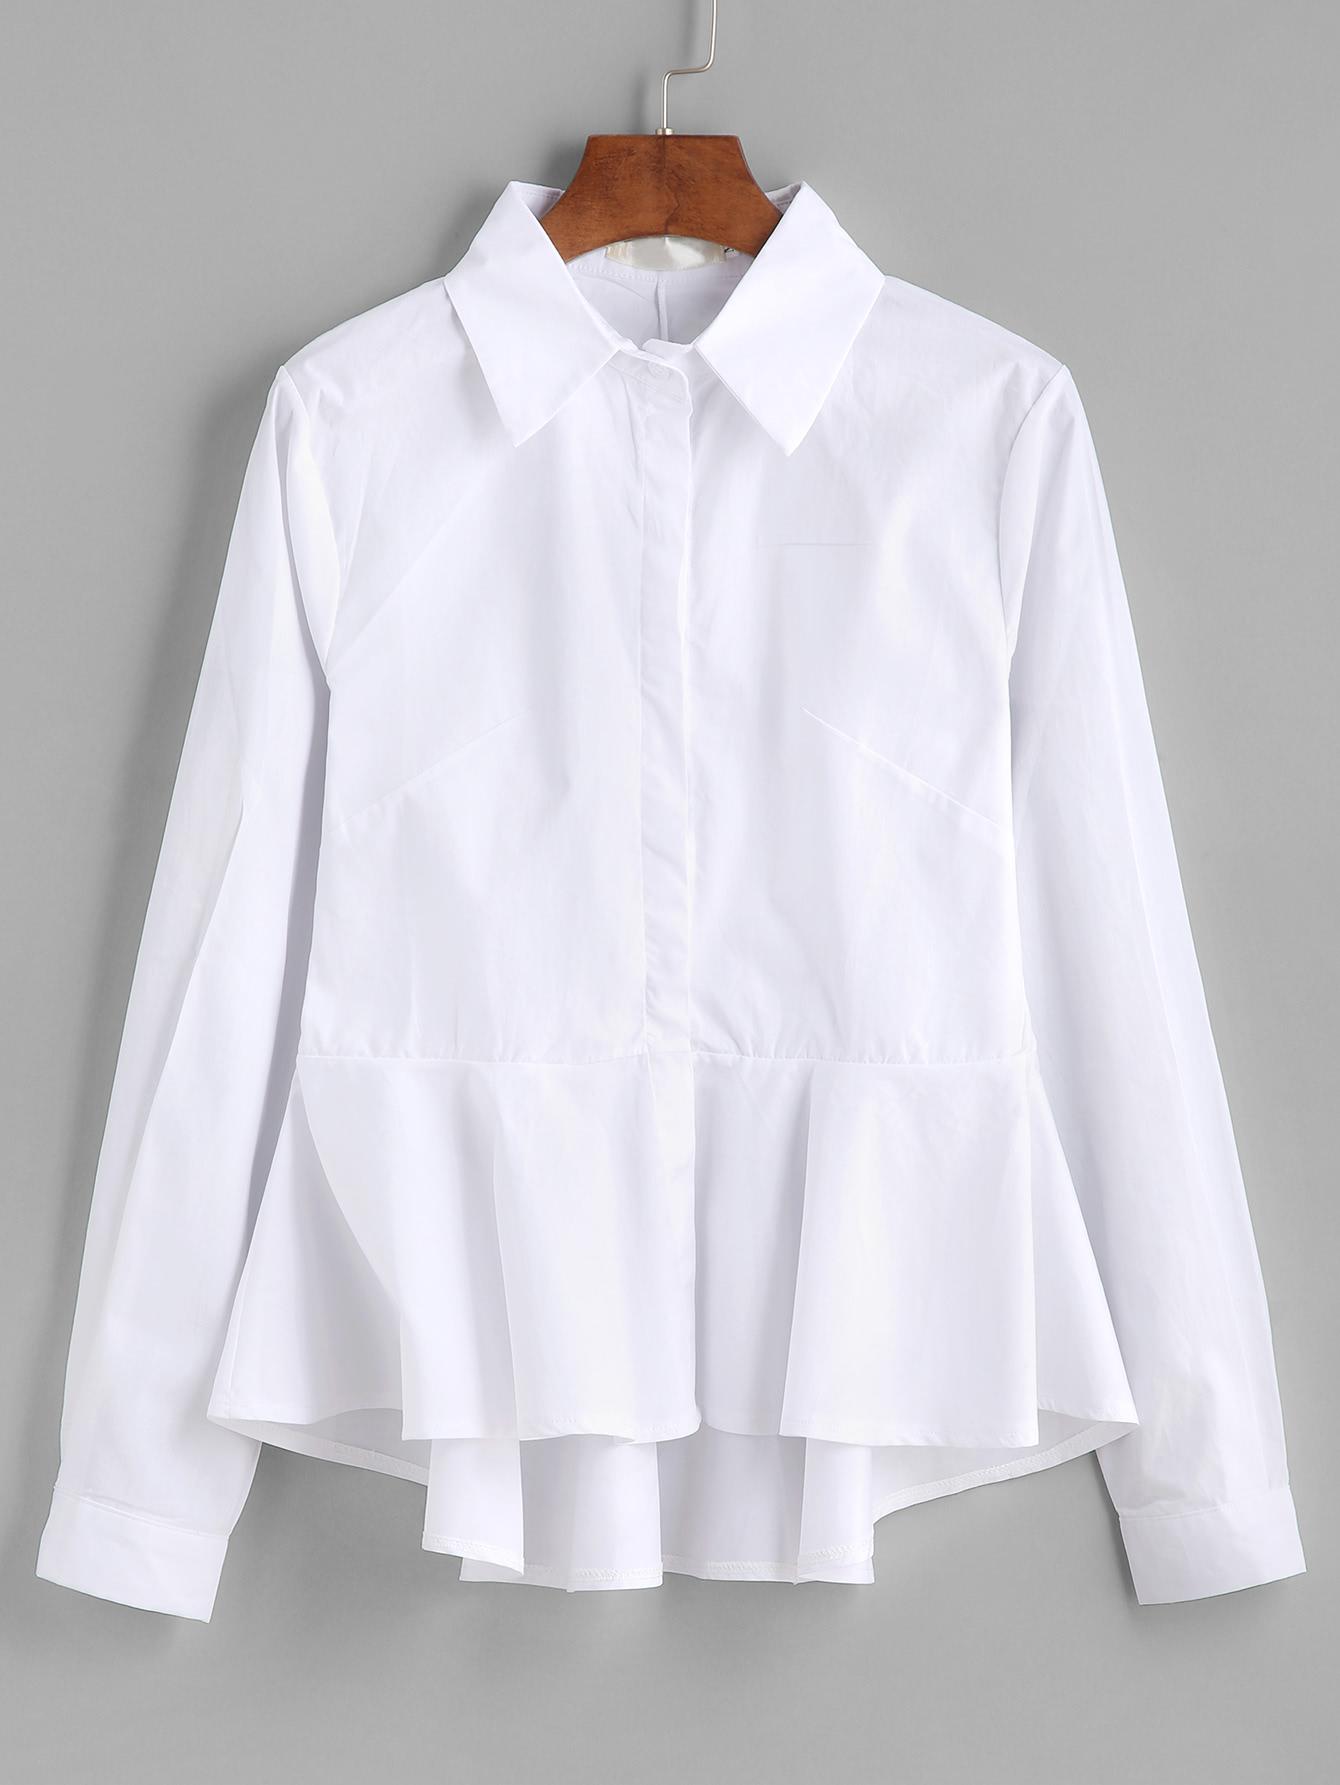 white blouse frill peplum dip hem blouse -shein(sheinside) ycuxinr